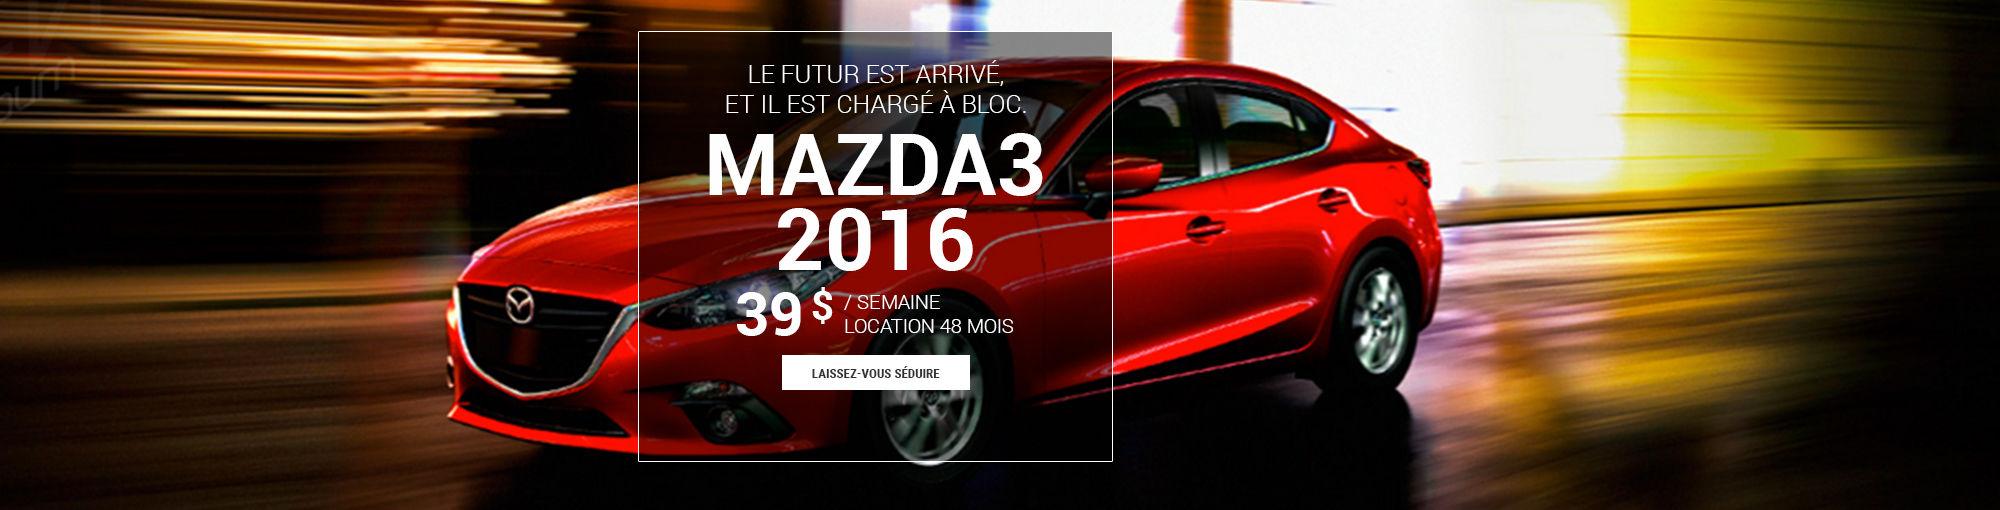 Mazda3 2016 -juillet 2016